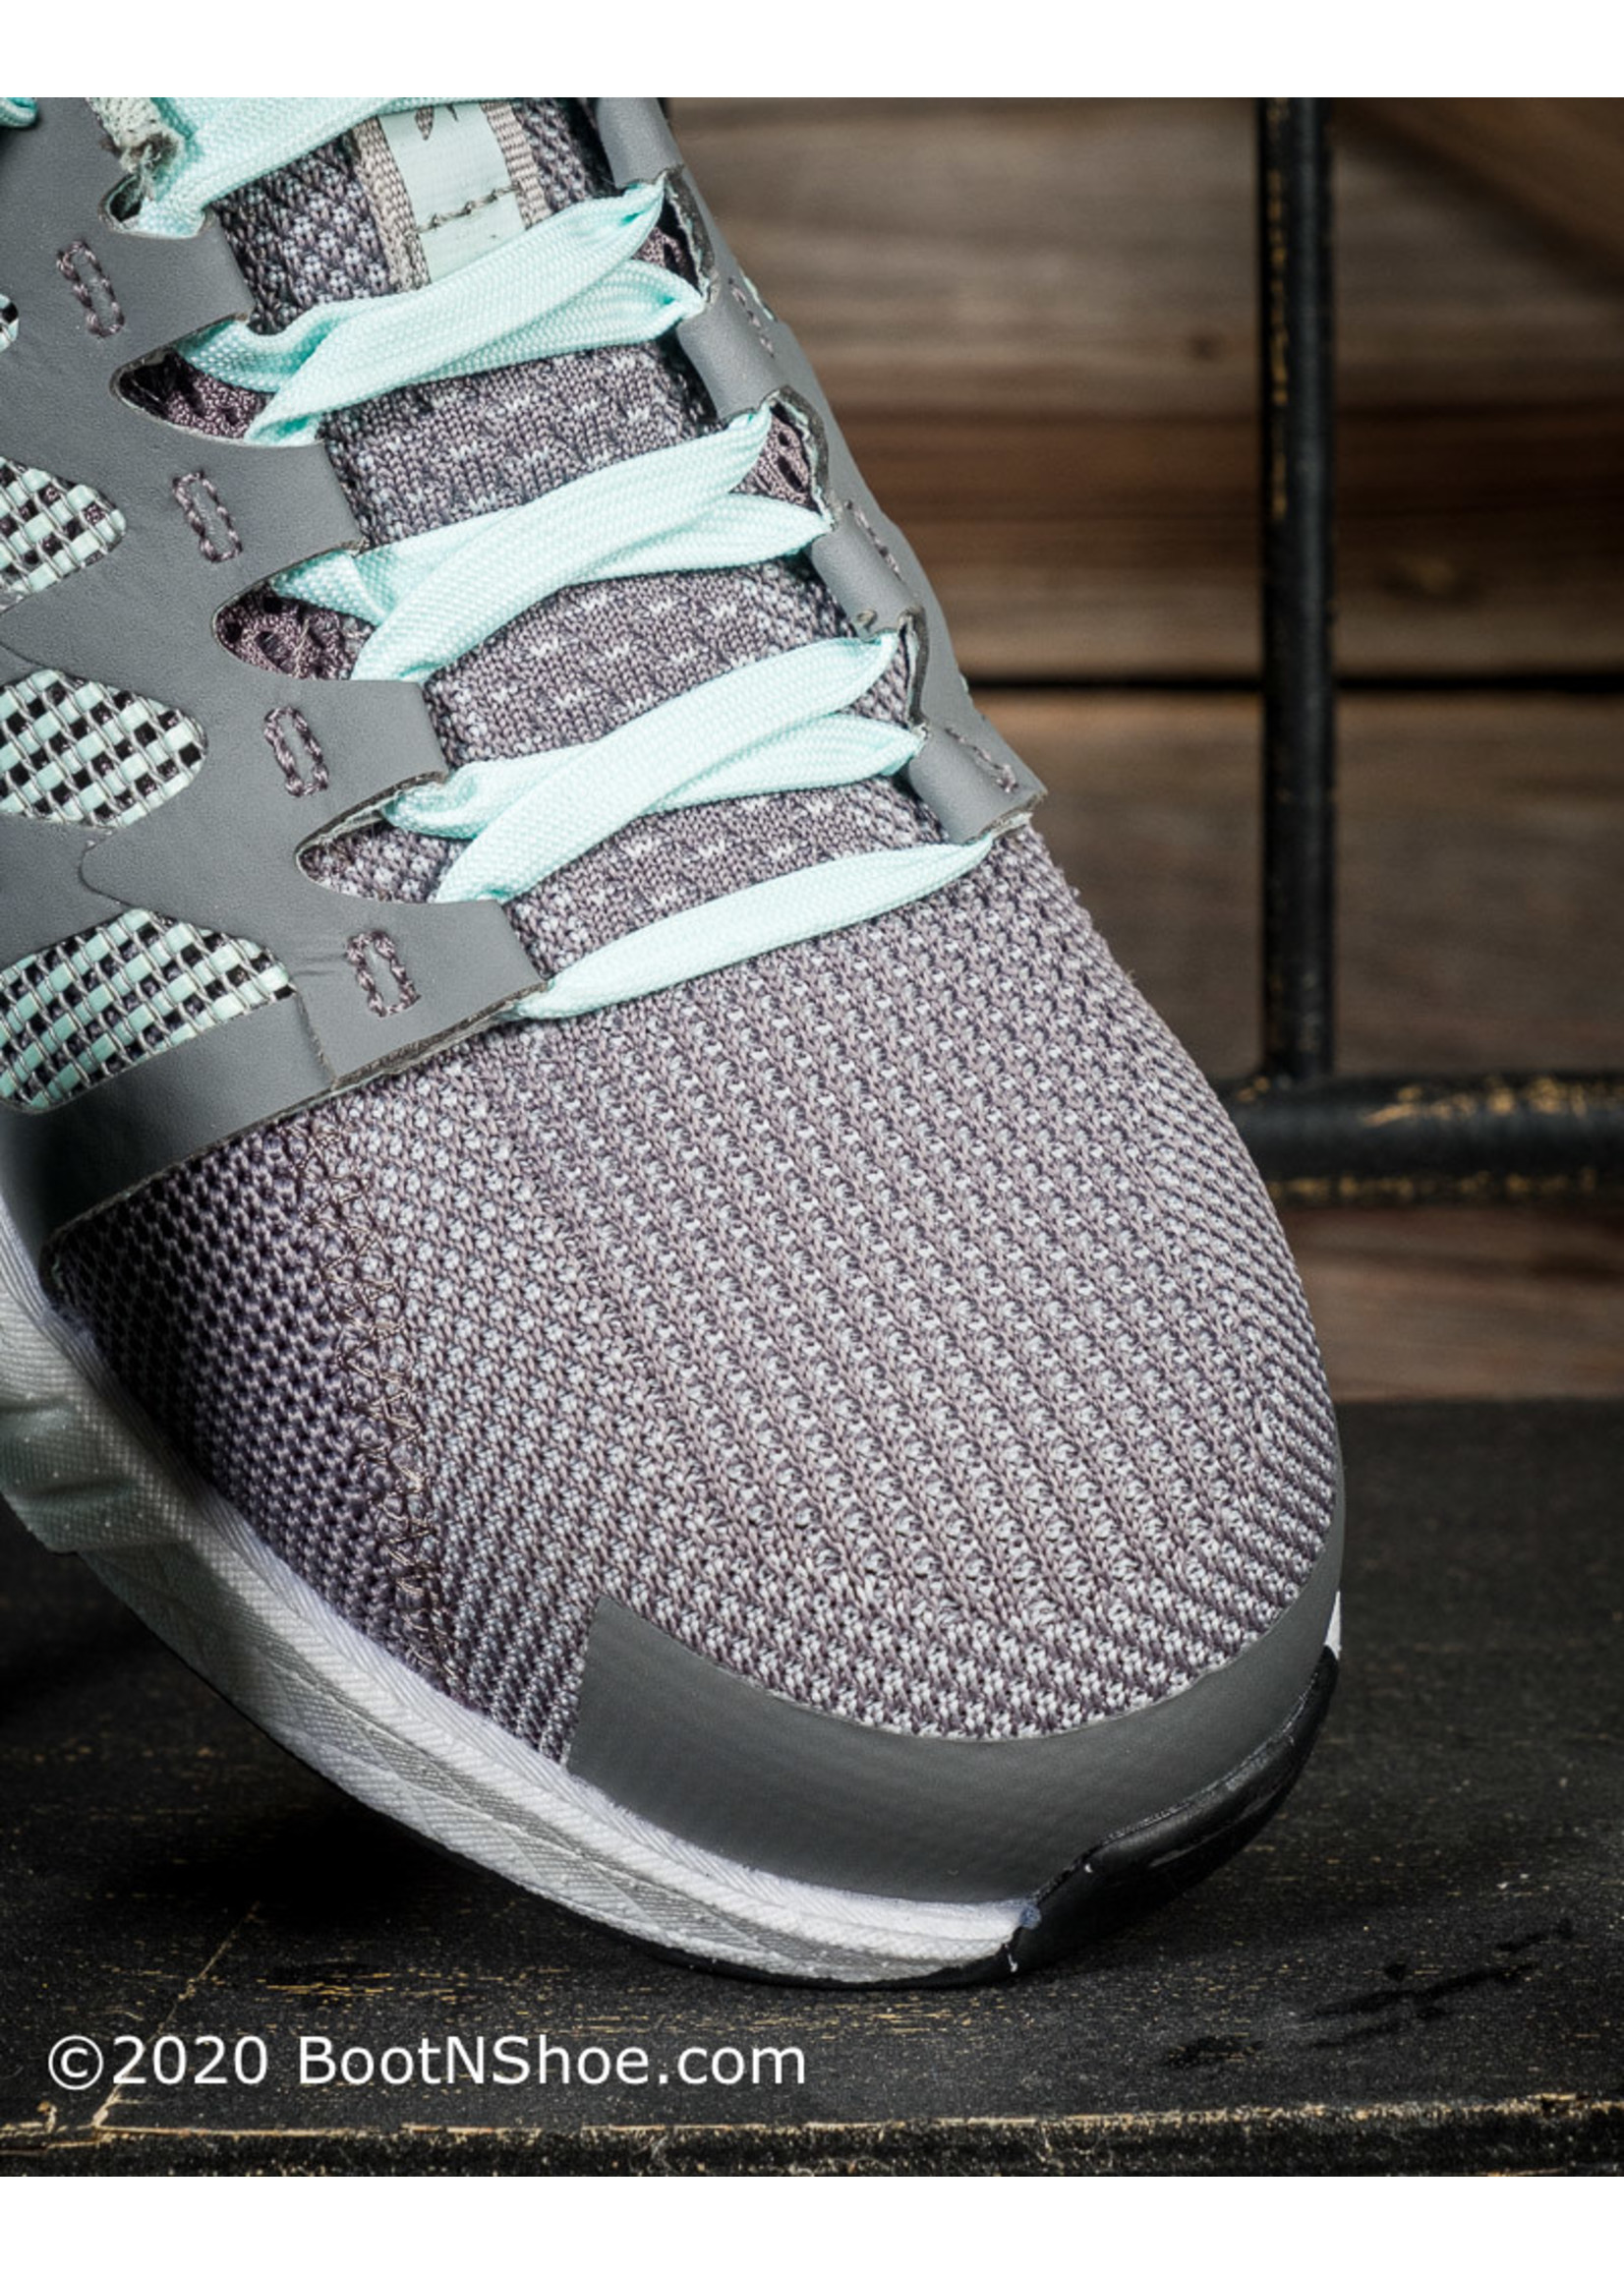 Reebok Women's Fusion Flexweave™ Gray & Mint Athletic Work Shoe  RB316